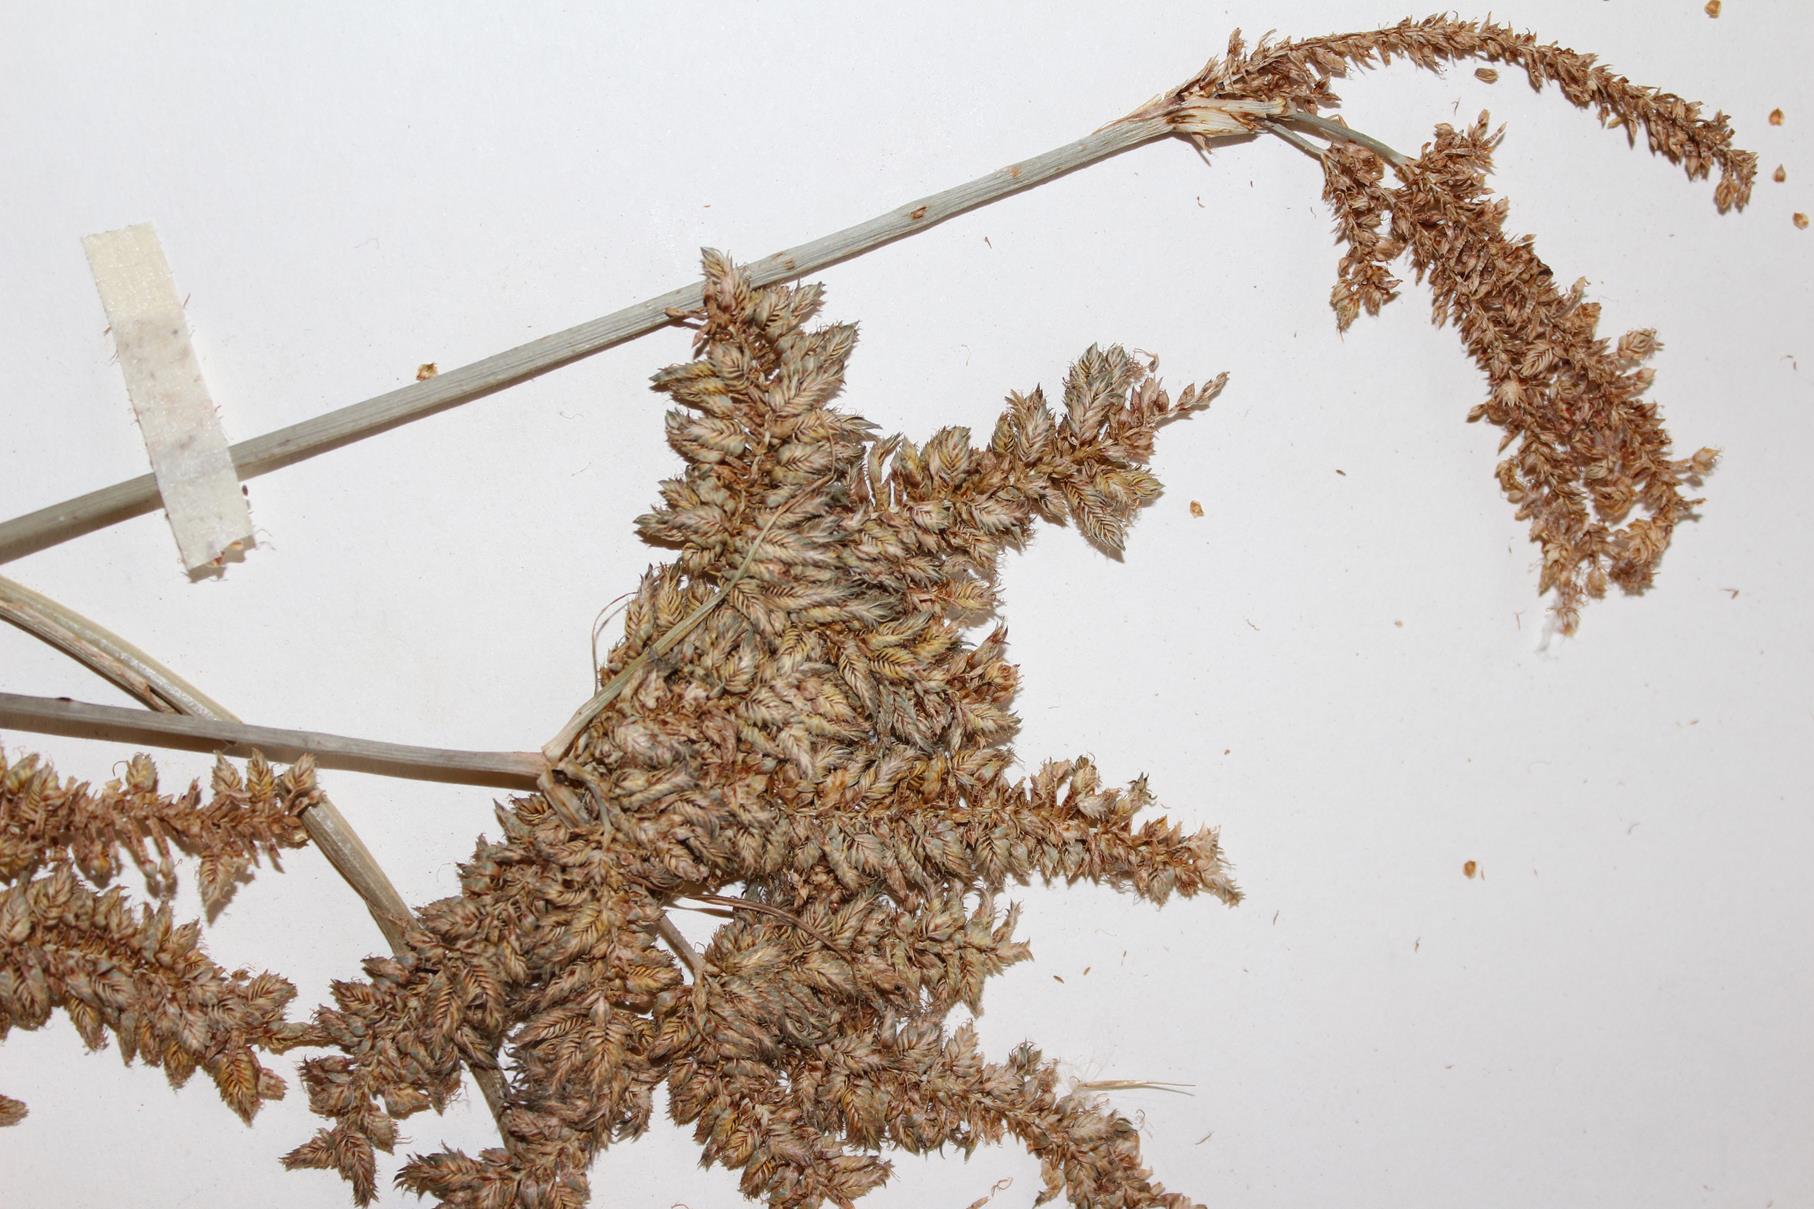 Cyperus alopecuroides